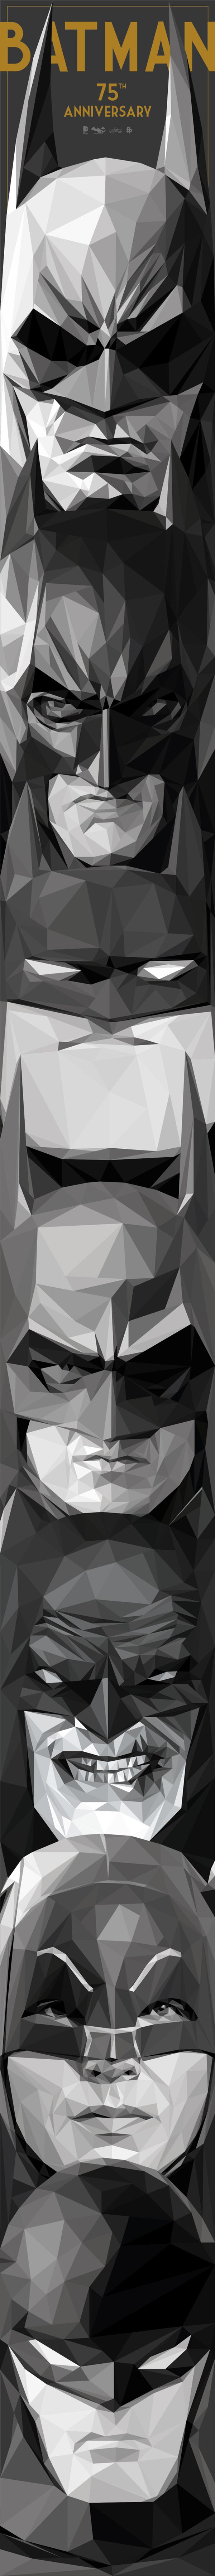 Batman 75th Anniversary - Totem Character Design, Digital Art, Illustration  inShare Simon Delart's Portfolio Paris, France  View All Projec...